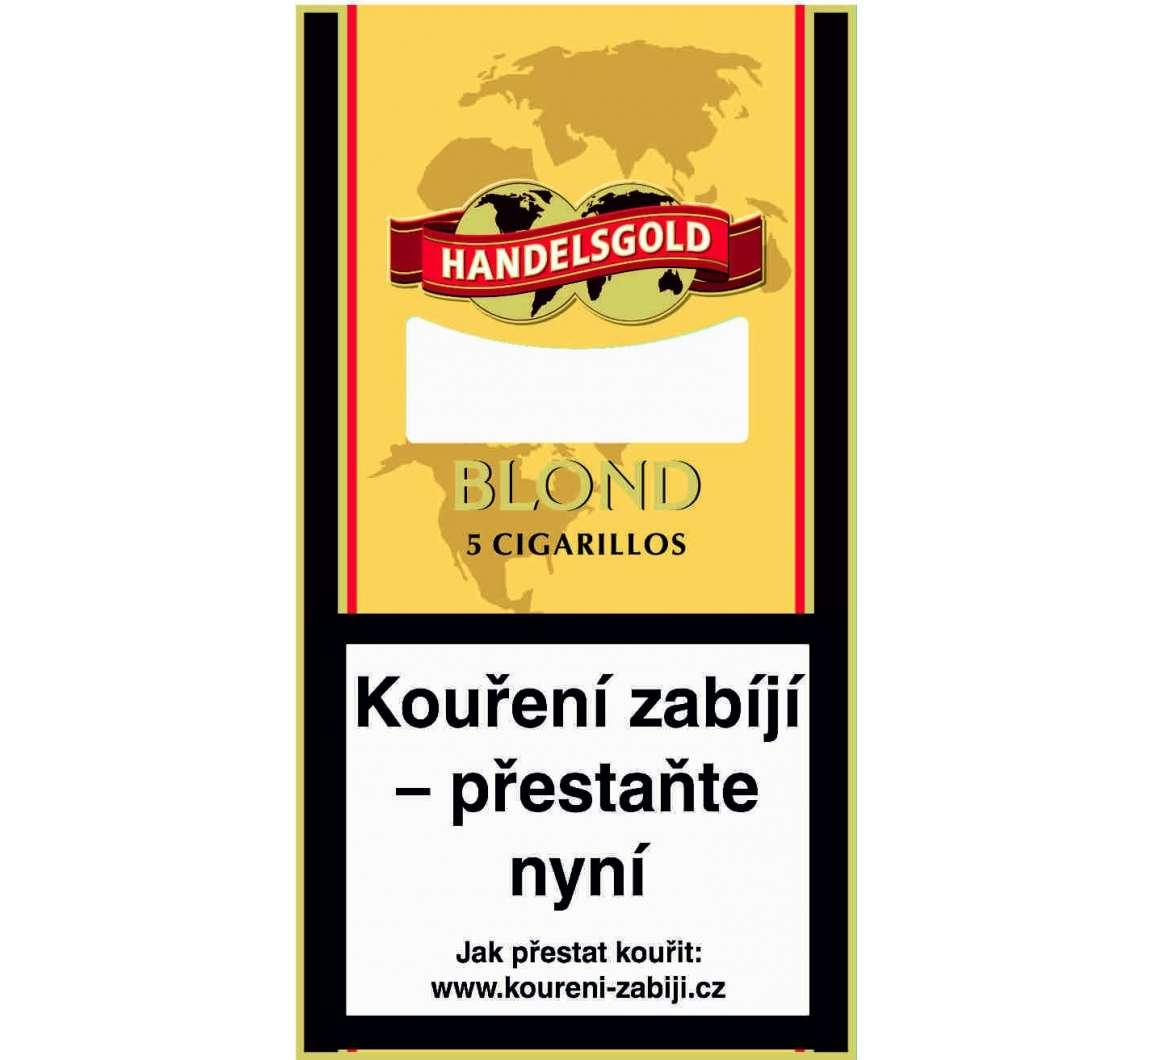 Handelsgold Blond 5ks